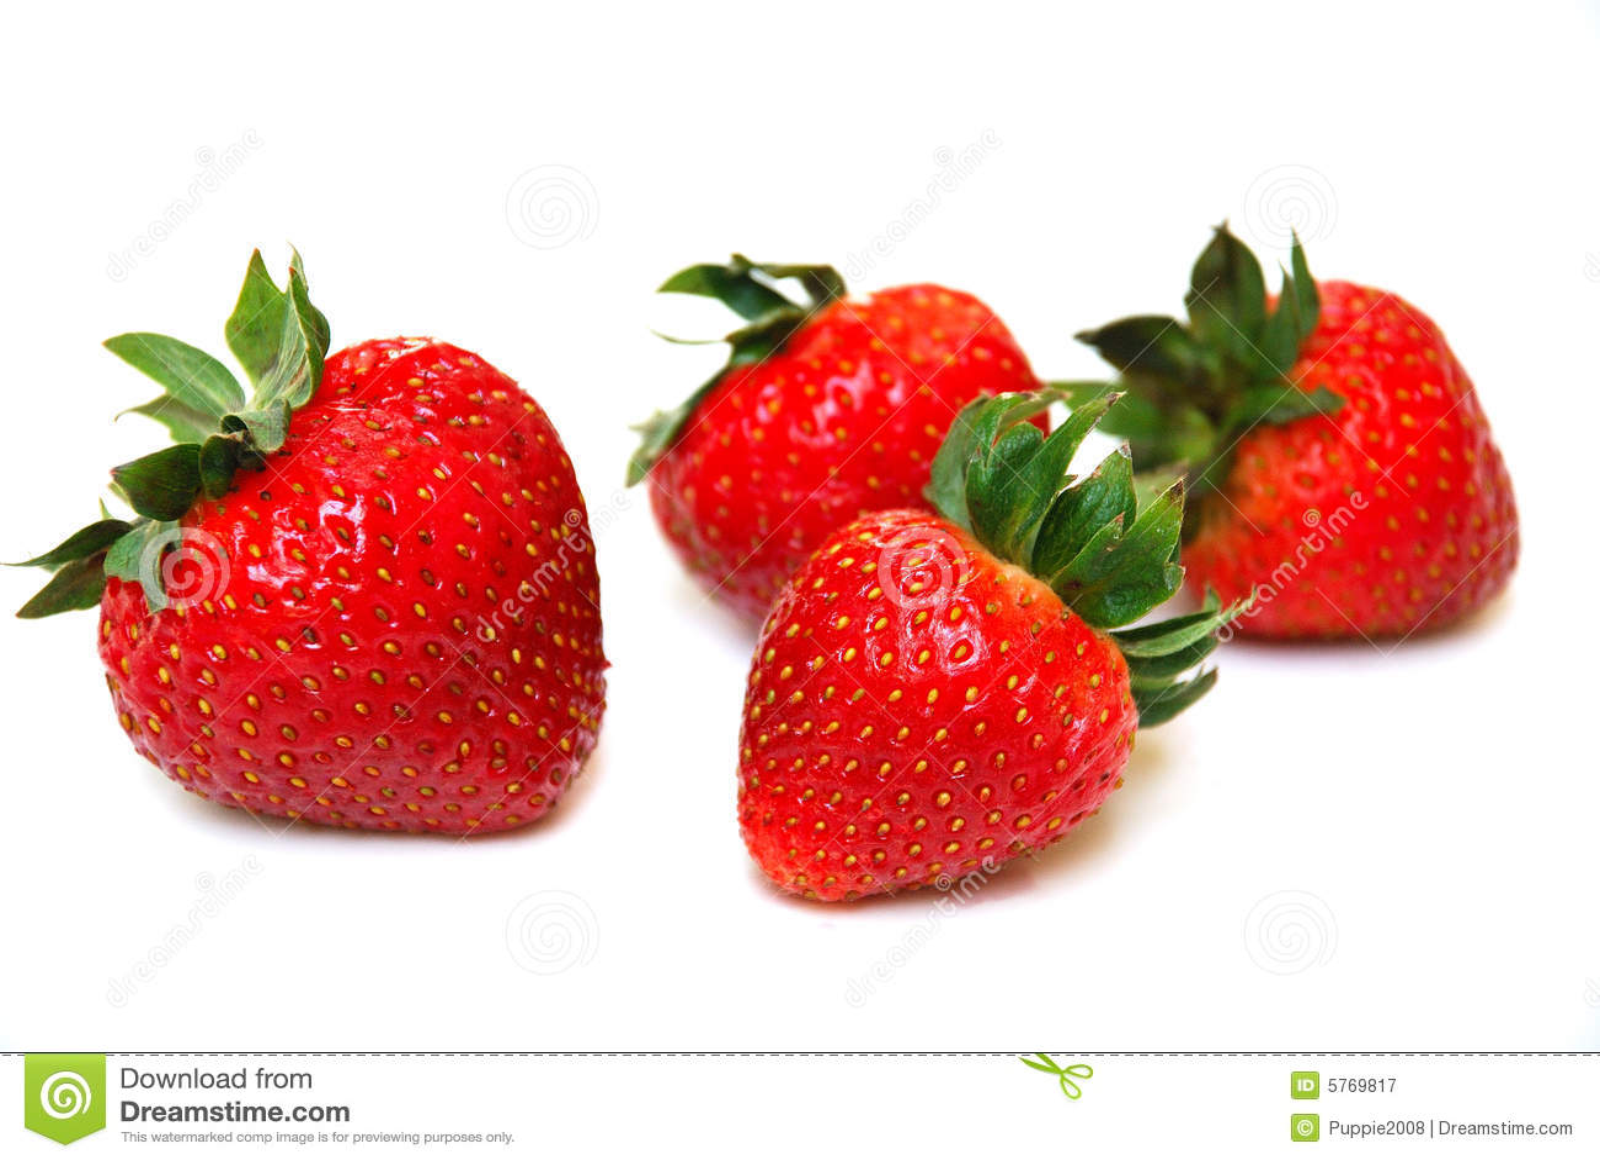 production technology of strawberry pdf